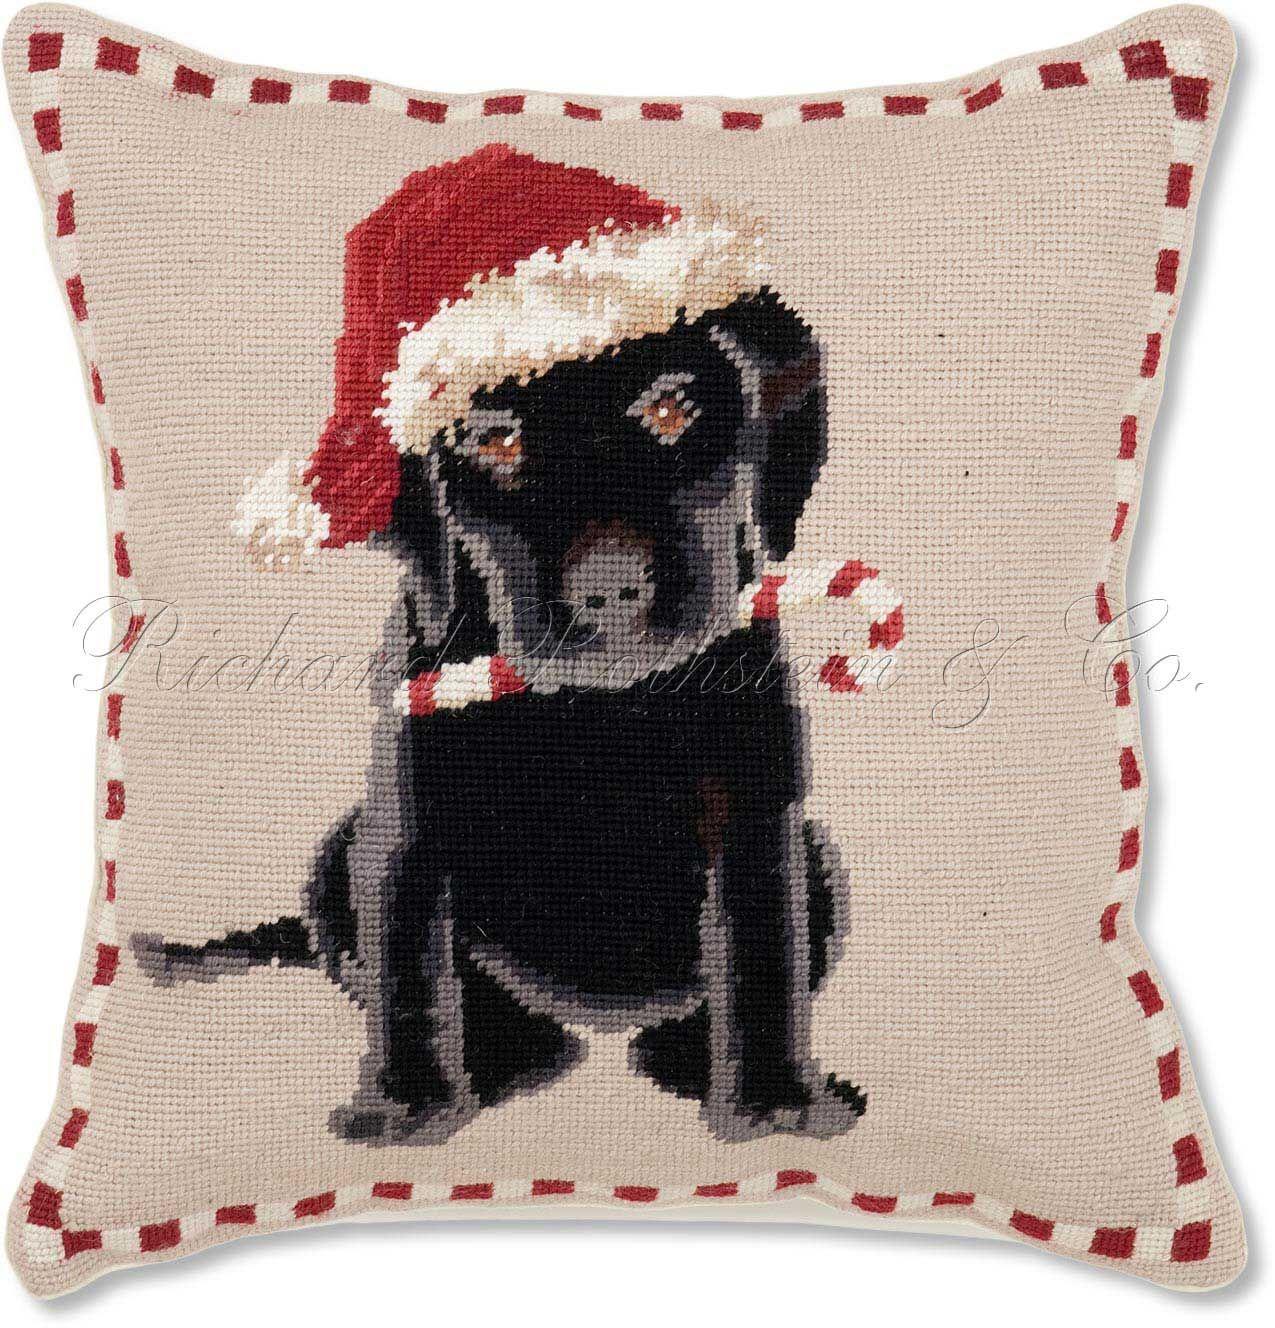 Holiday Labrador Puppy Christmas Needlepoint Pillow   Christmas ...